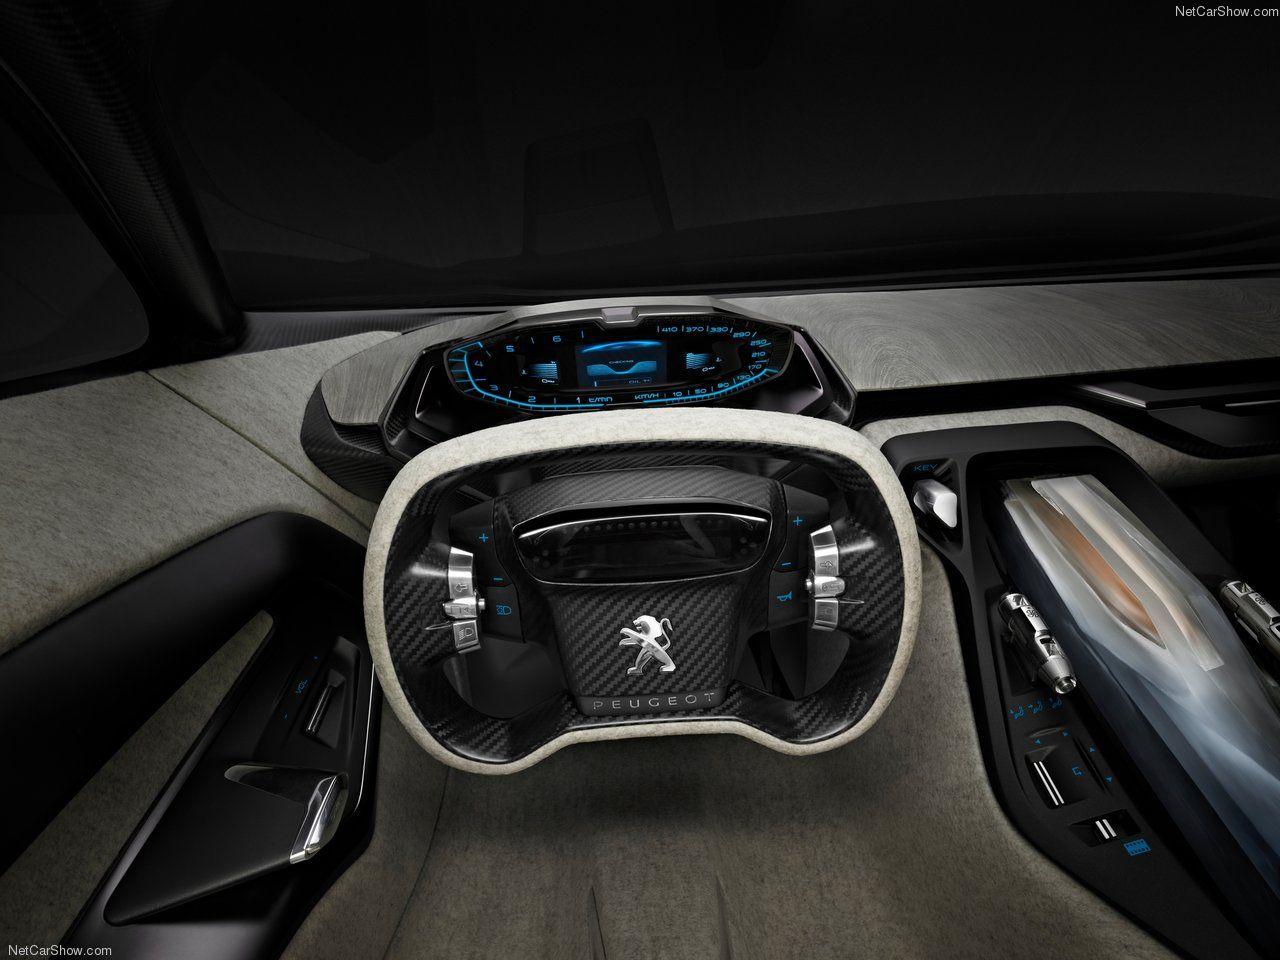 Peugeot Onyx Concept Futuristic Interior 2012 1280x960 Future